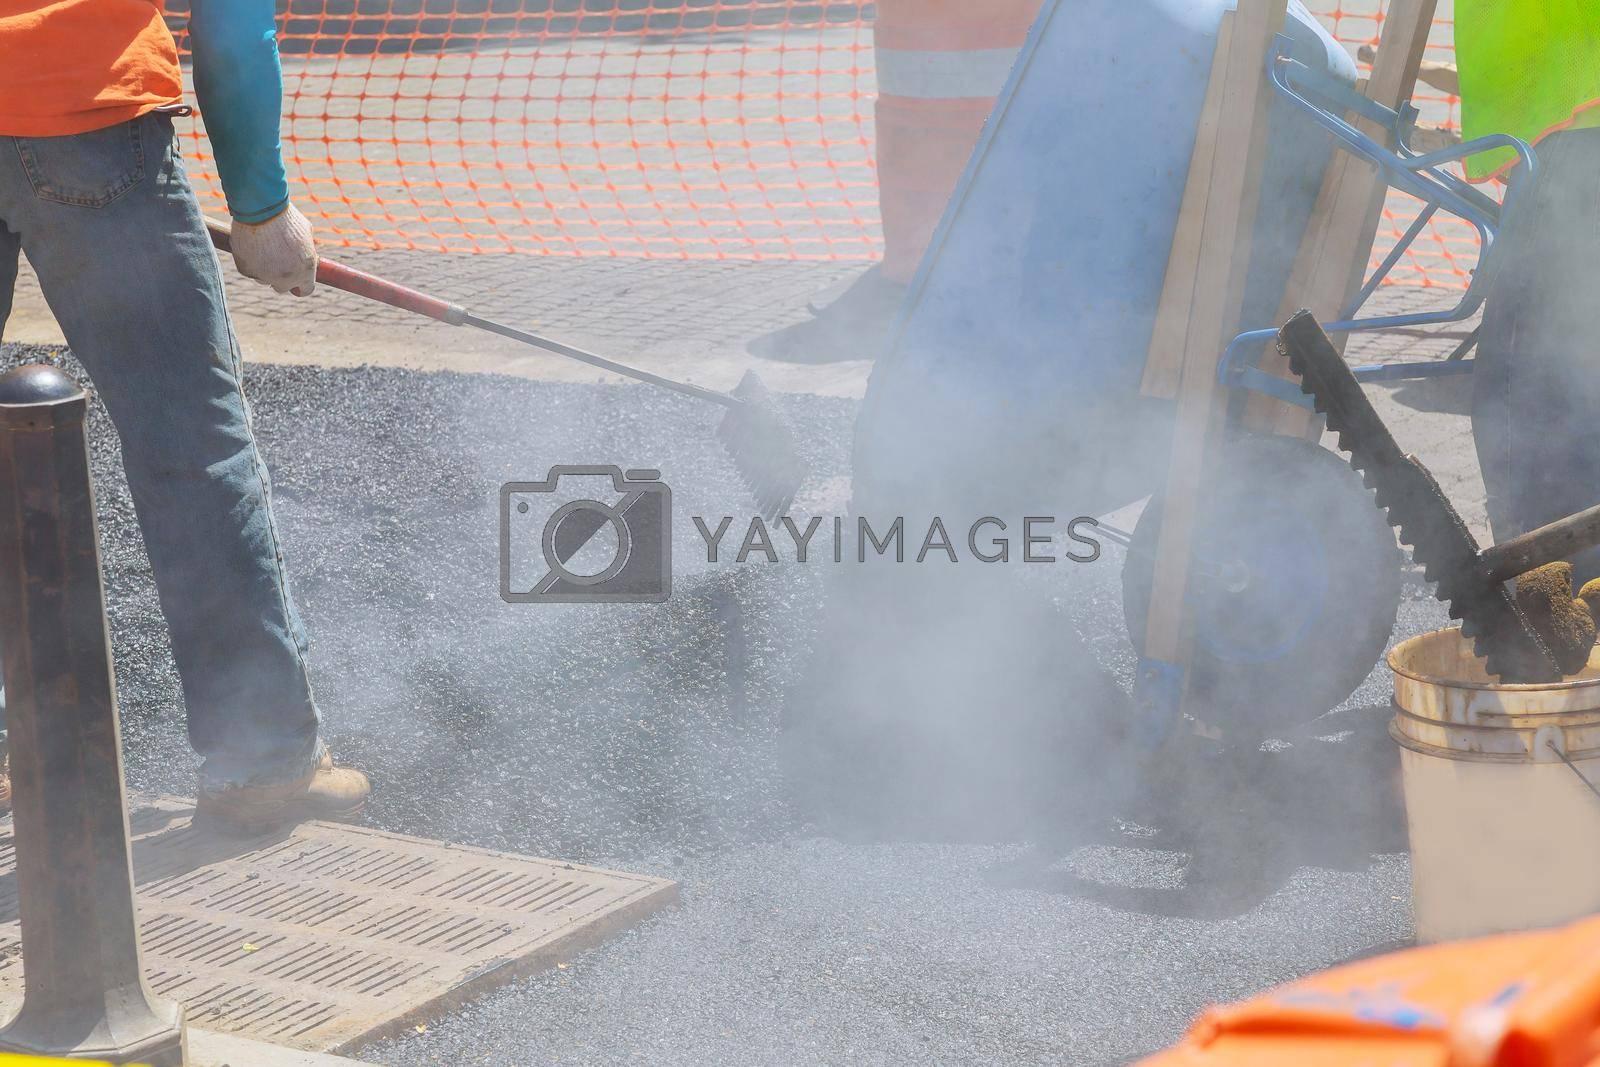 While laying asphalt road worker repair asphalt covering new road surface